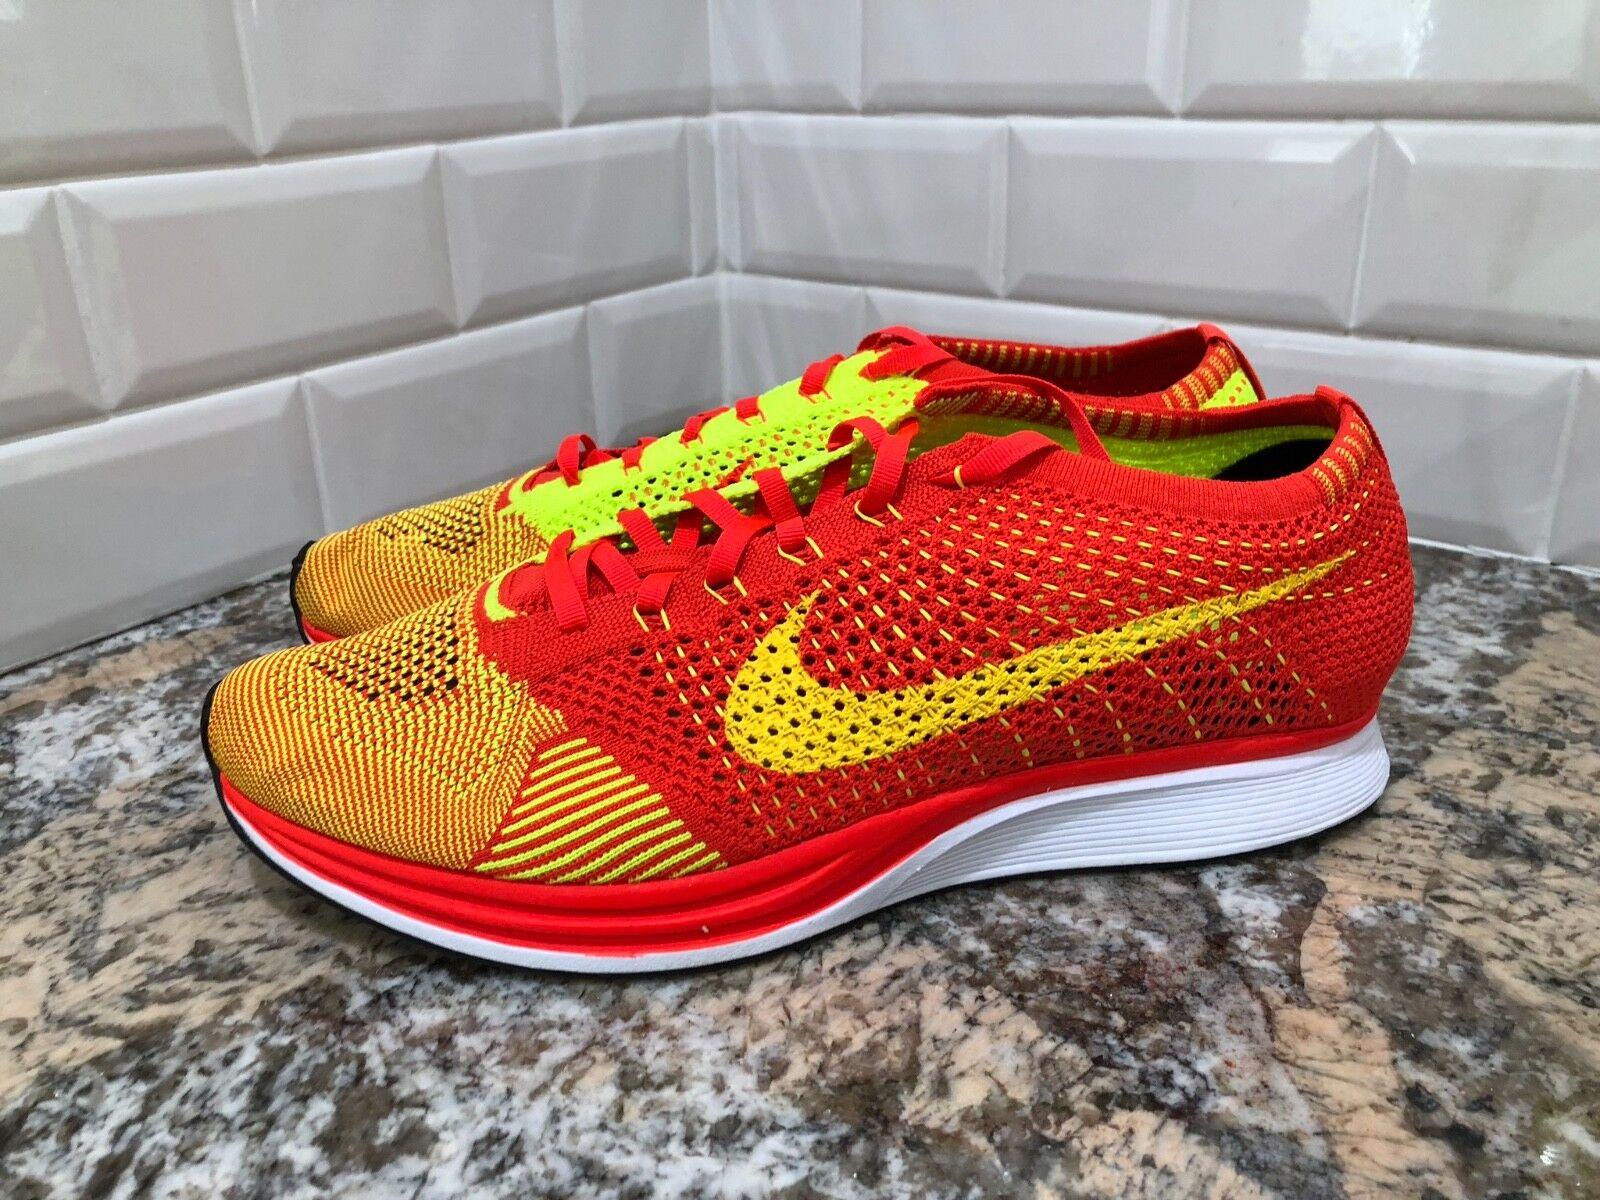 2015 Nike Flyknit Racer Bright Crimson/Volt Size Trainer 526628 -601 SZ 13